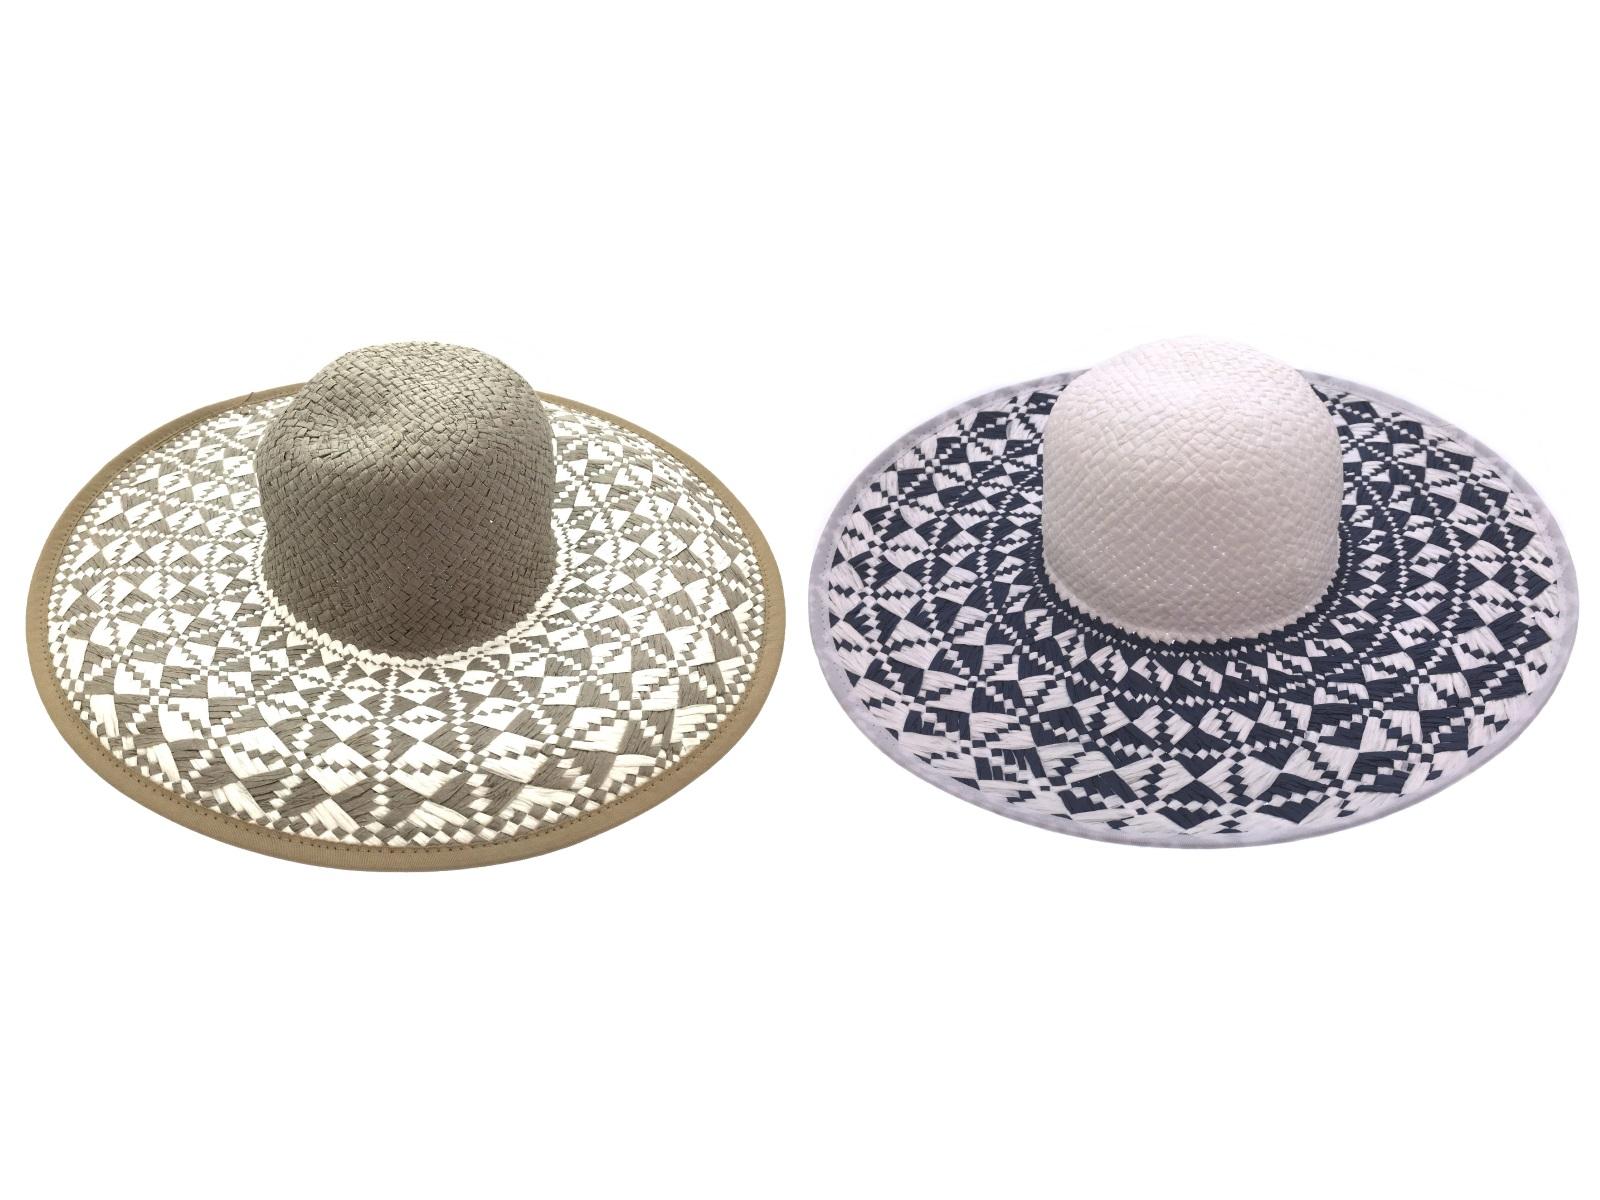 461bb3e4bd7 Womens Wide Brim Floppy Summer Hat Crushable Packable Beach Sun Hat One Size